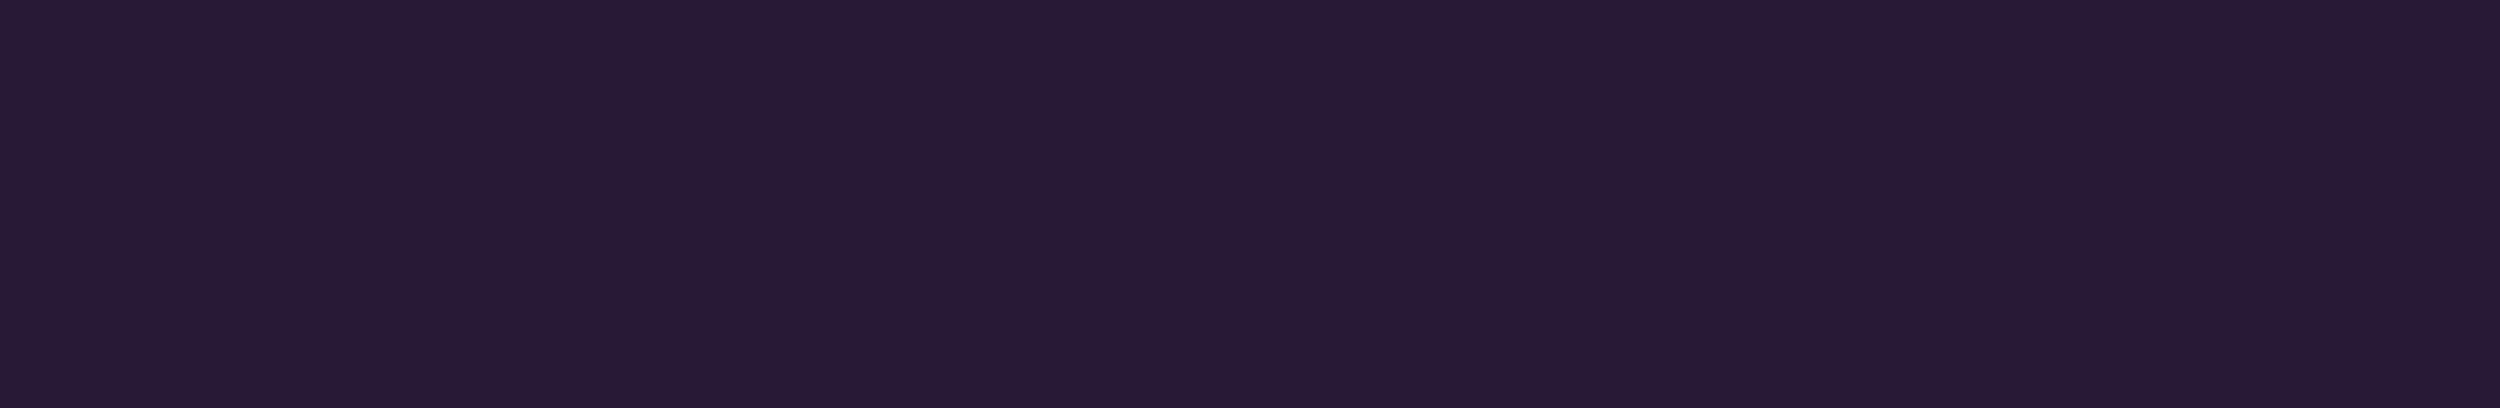 skinny_banner_no_pattern.jpg